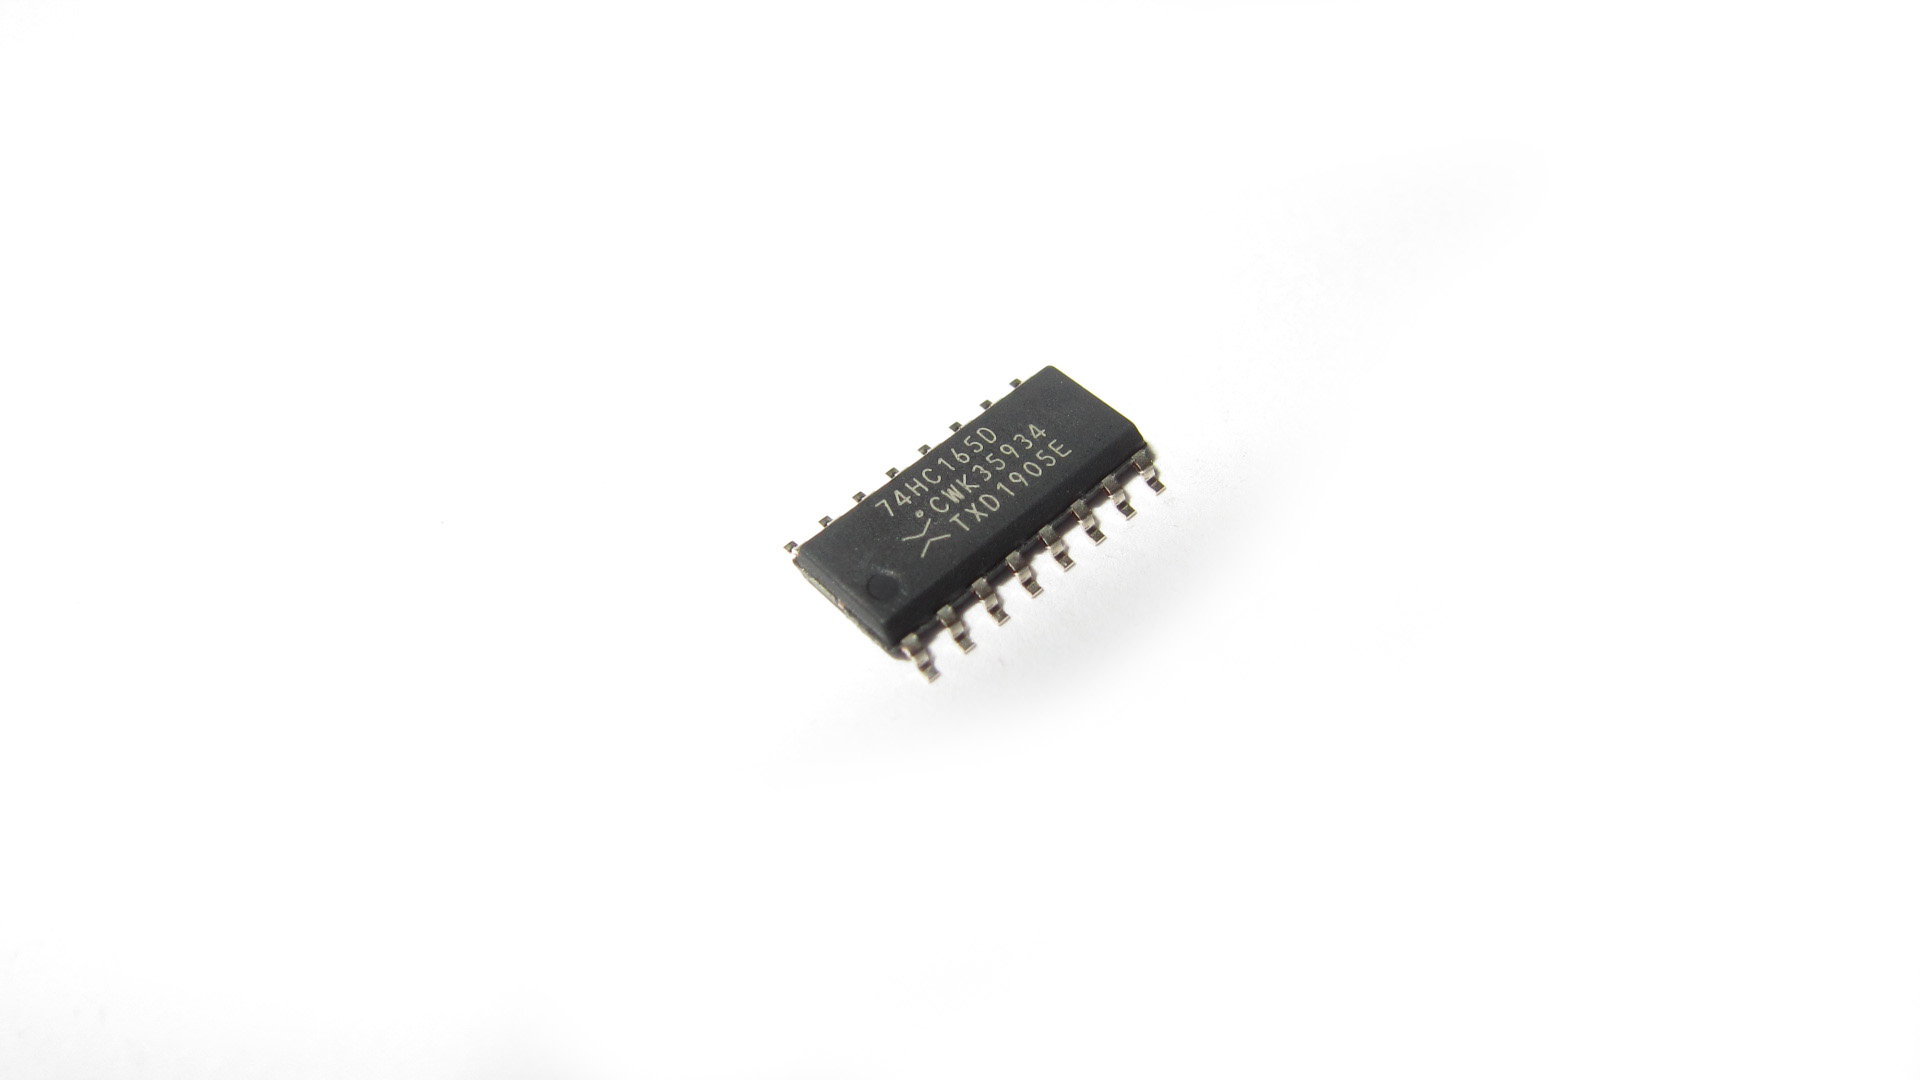 74HC165D NXP 移位寄存器  74系列  SOP16 原厂原装正品